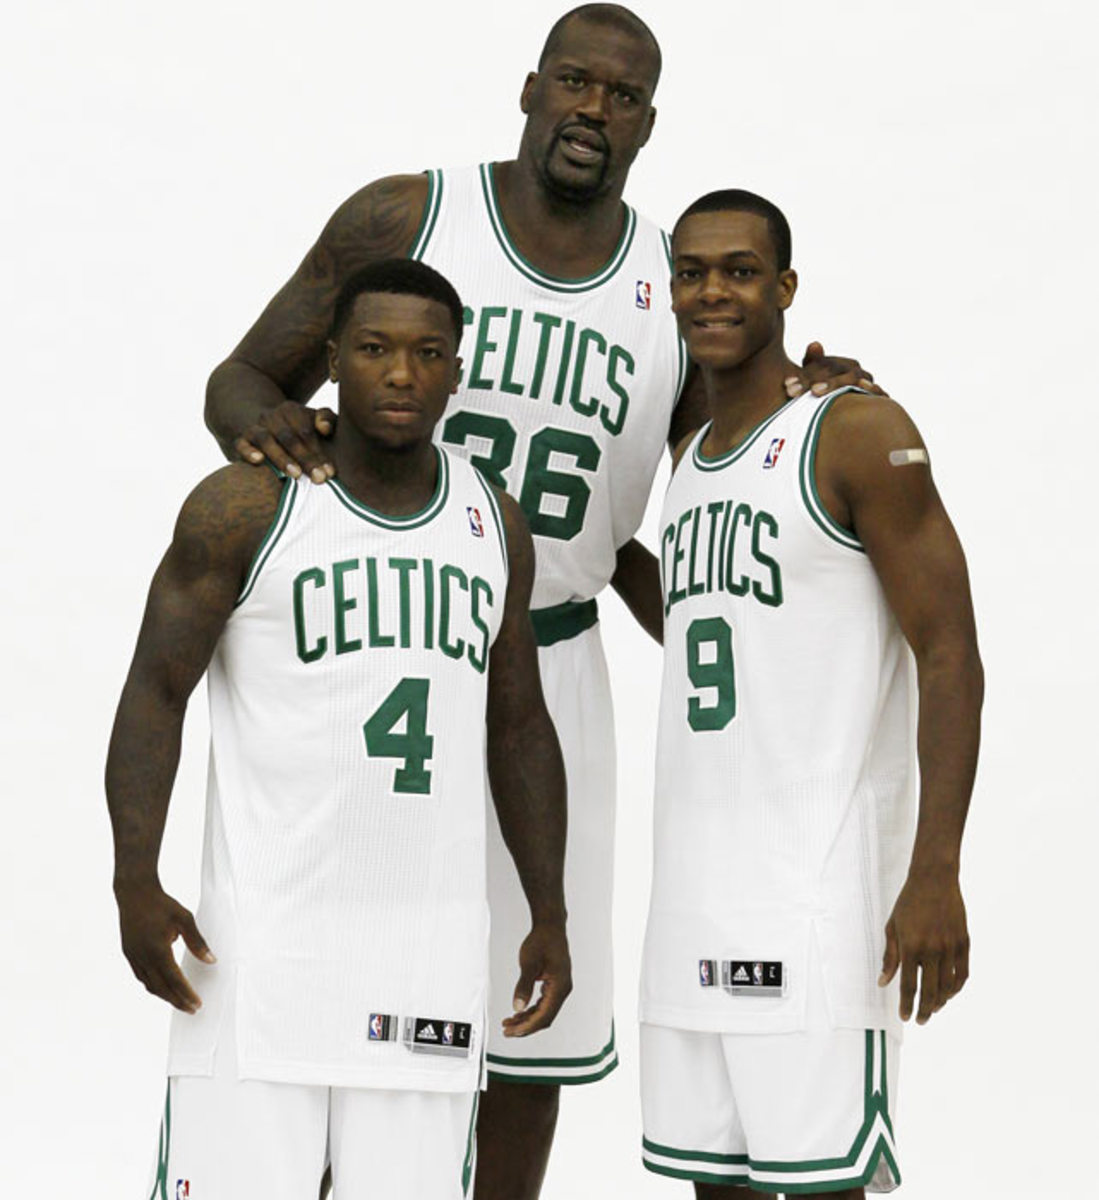 Shaquille O'Neal, Nate Robinson and Rajon Rondo